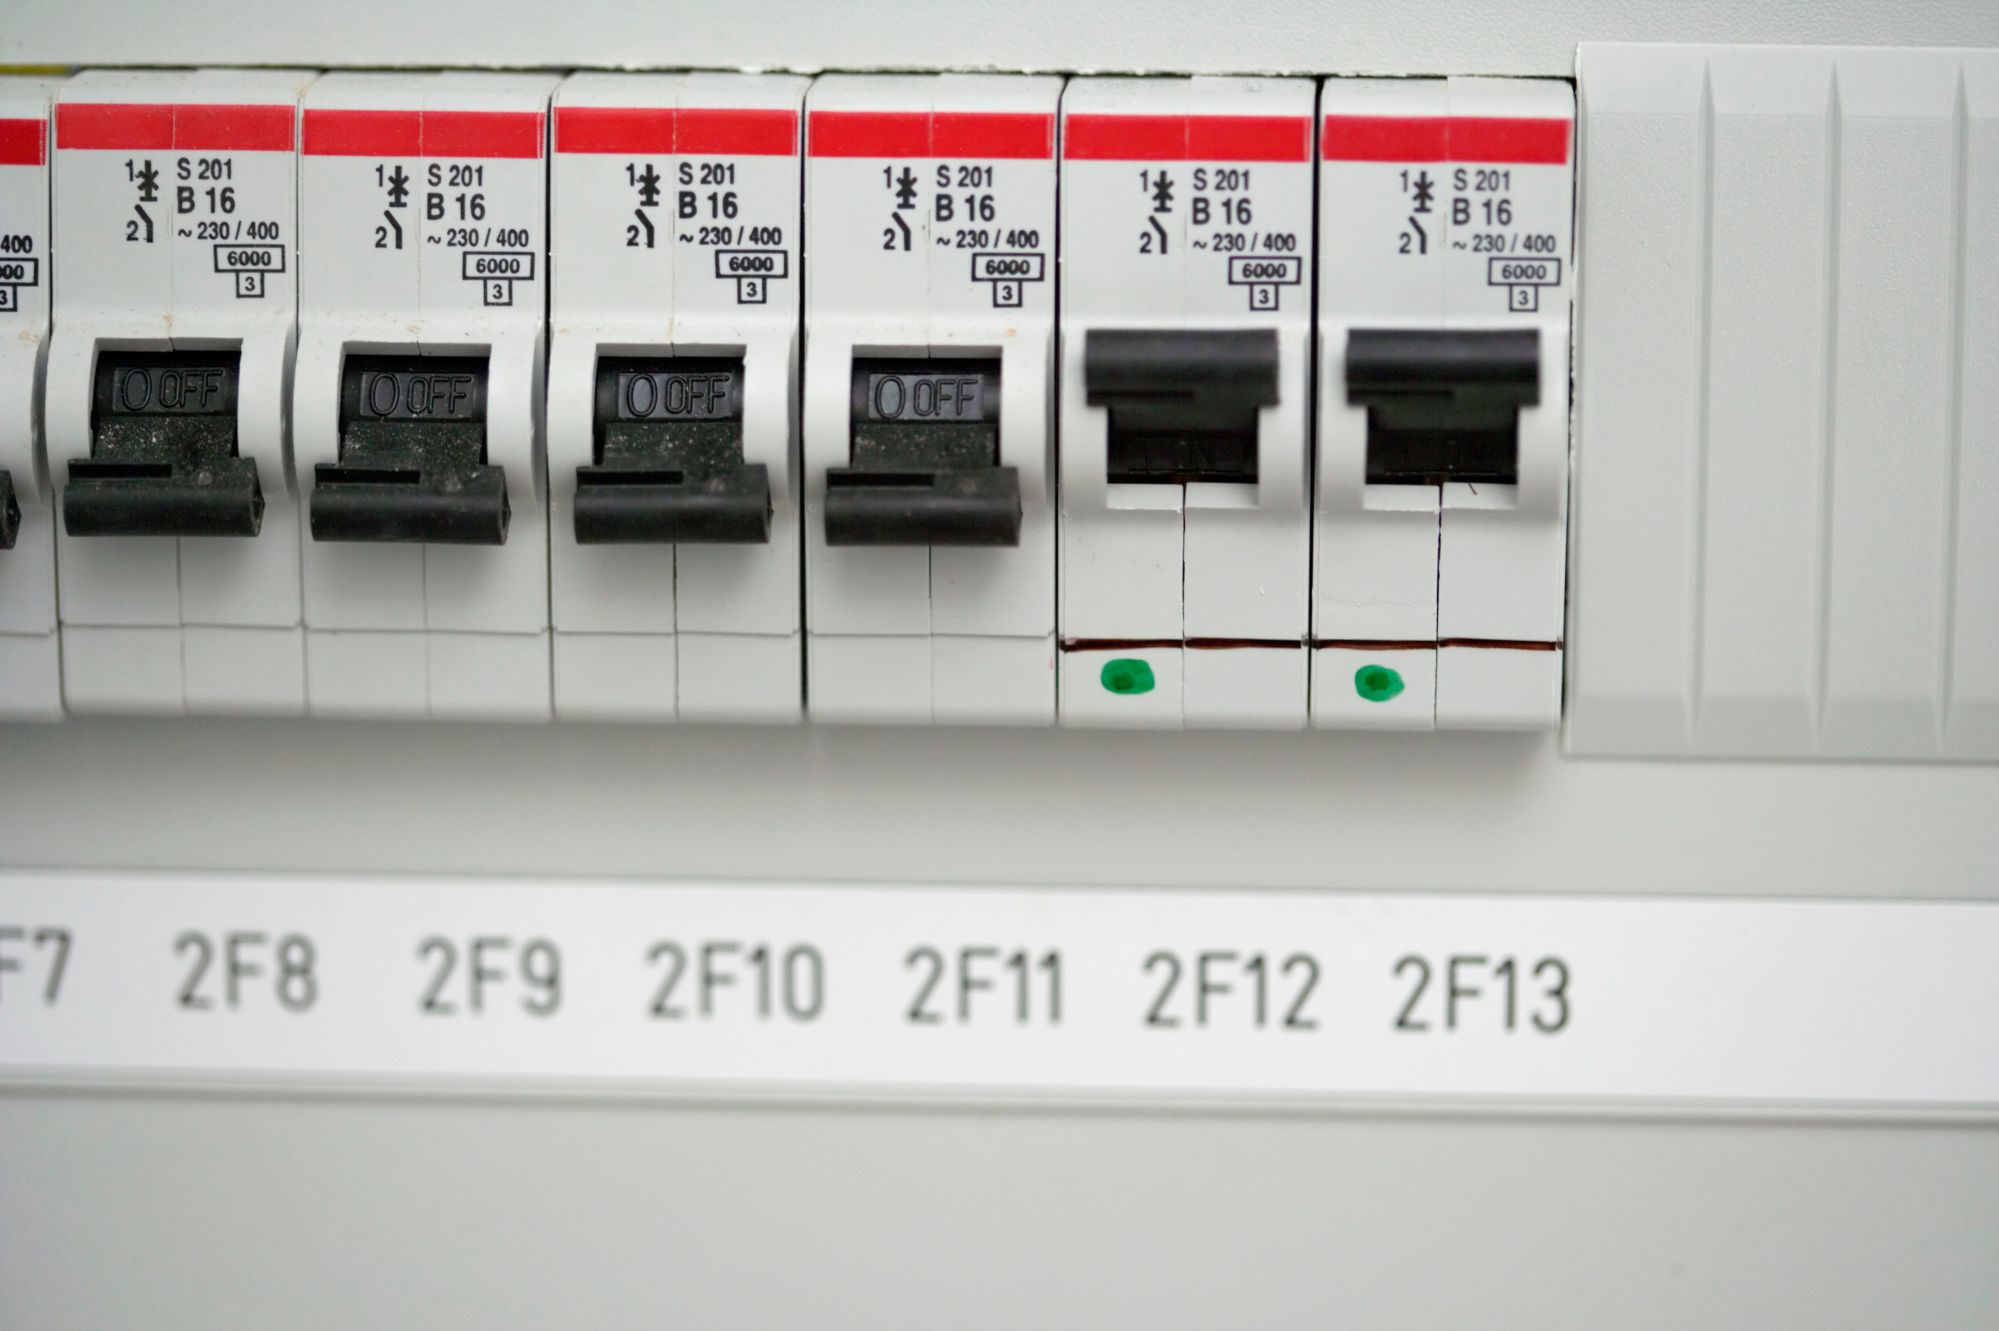 hight resolution of single circuit breaker fuse box